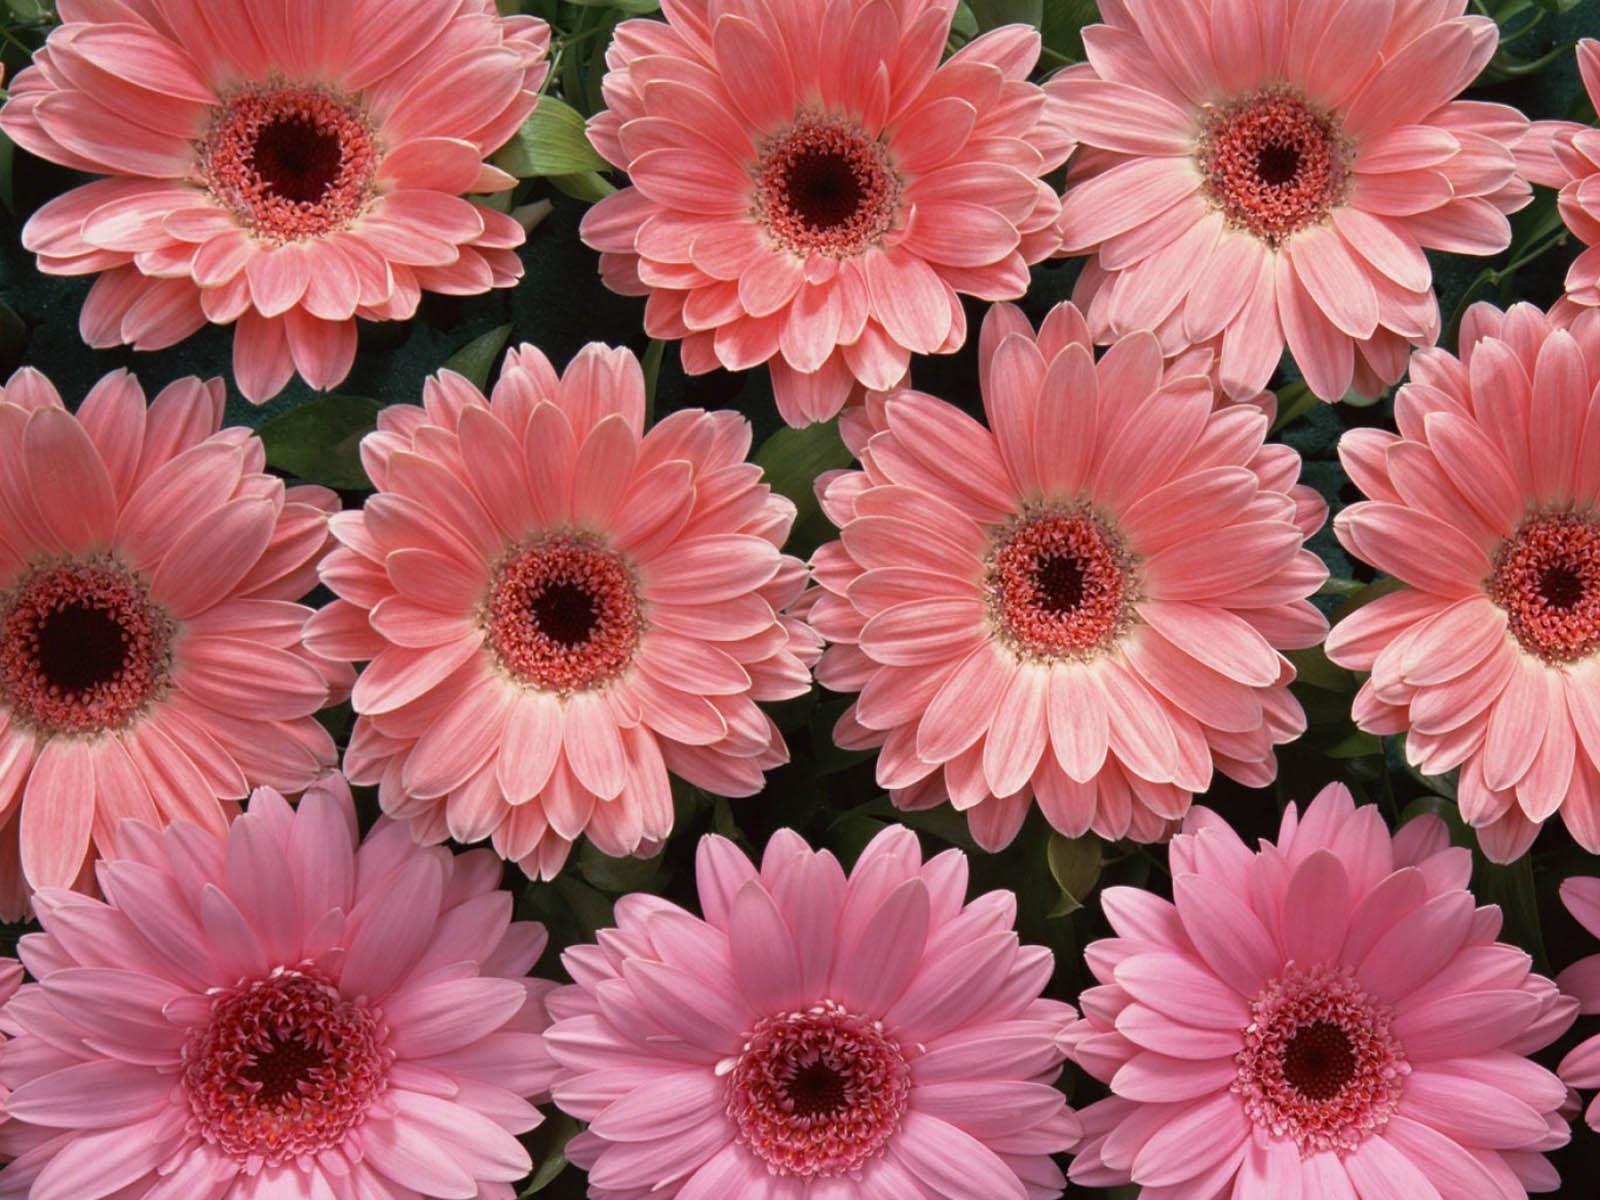 Pink Flowers Wallpapers:wallpapers screensavers